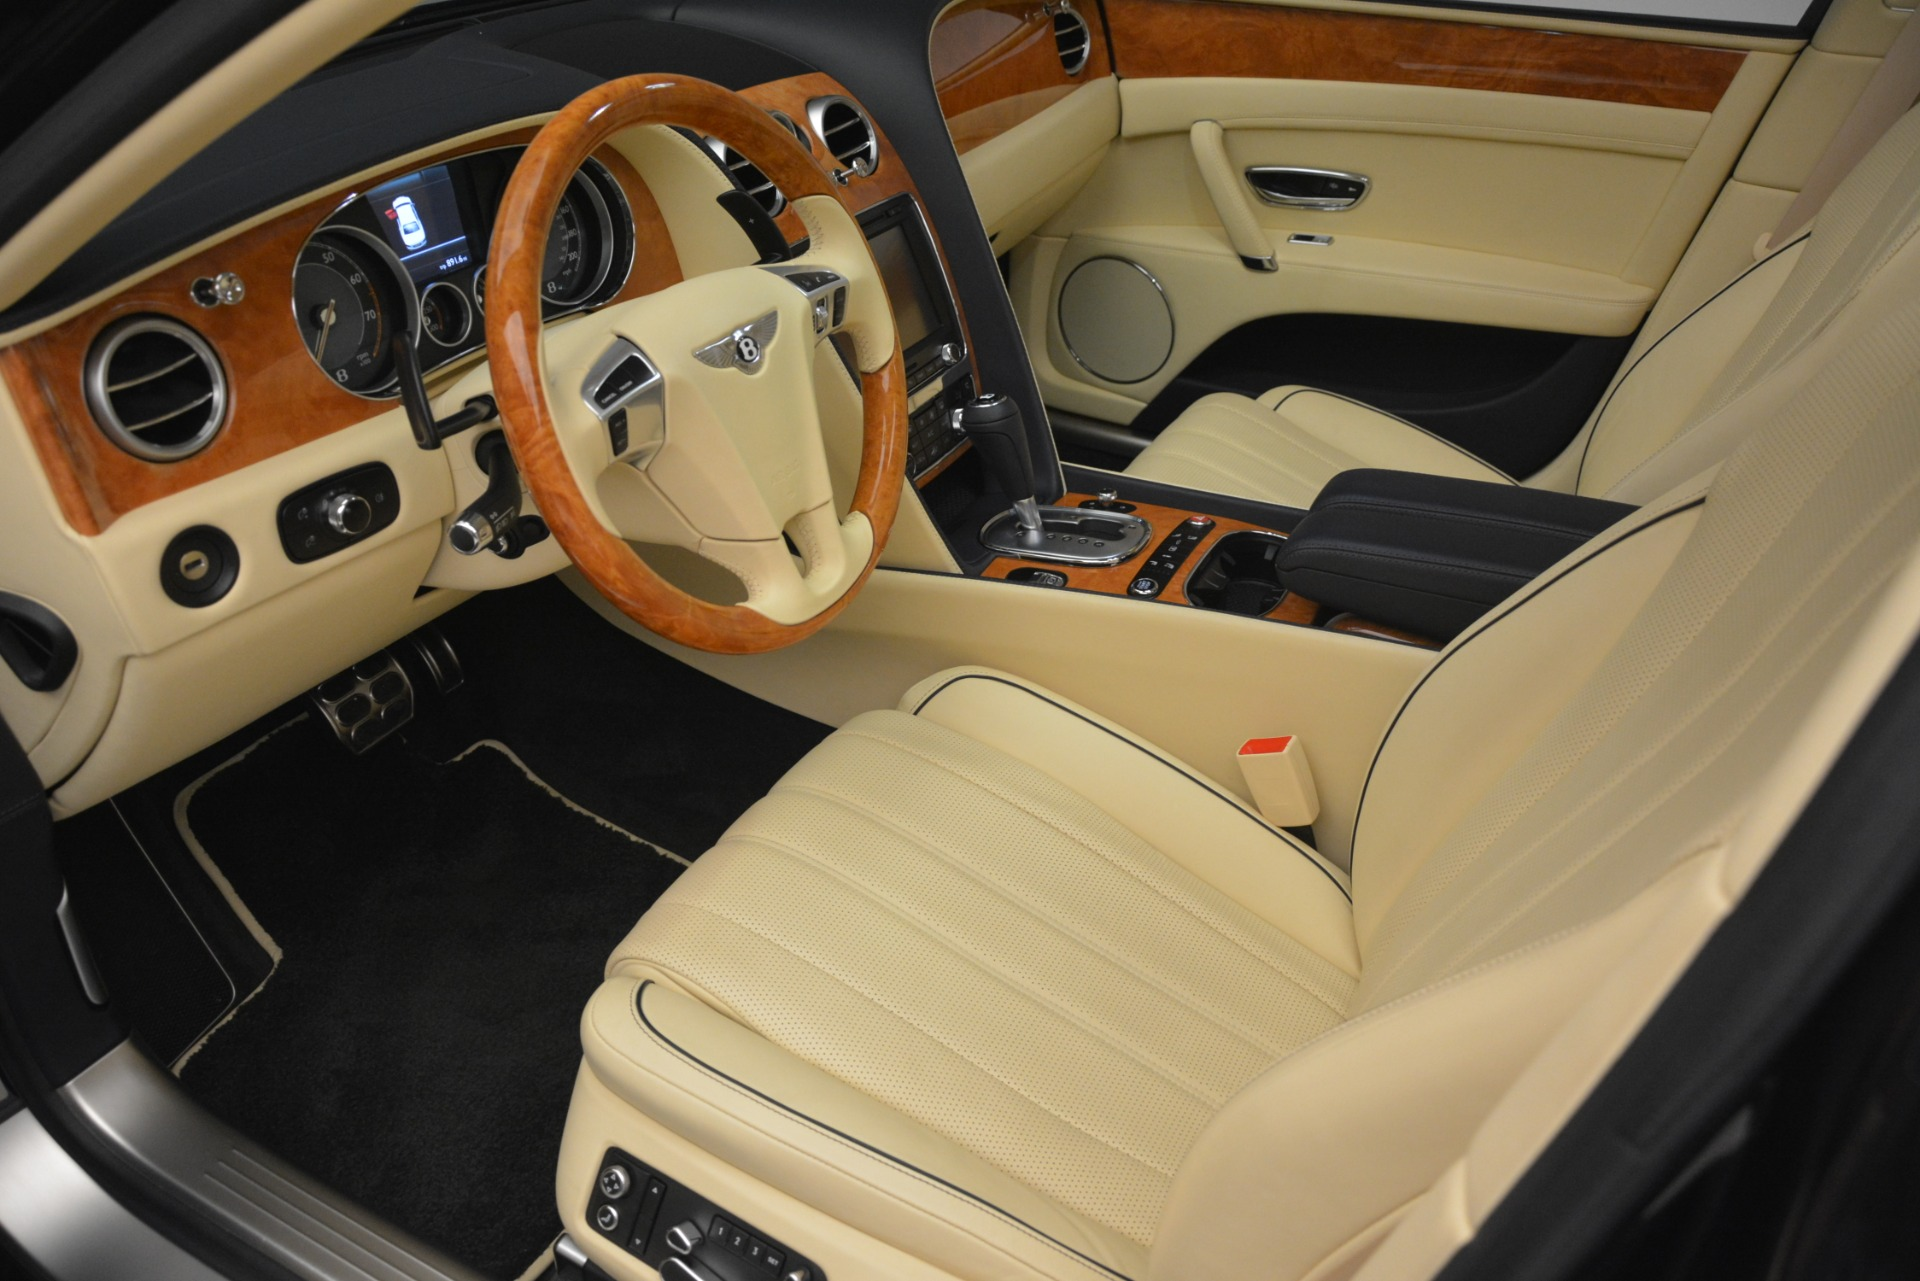 Used 2015 Bentley Flying Spur V8 For Sale In Westport, CT 2997_p16